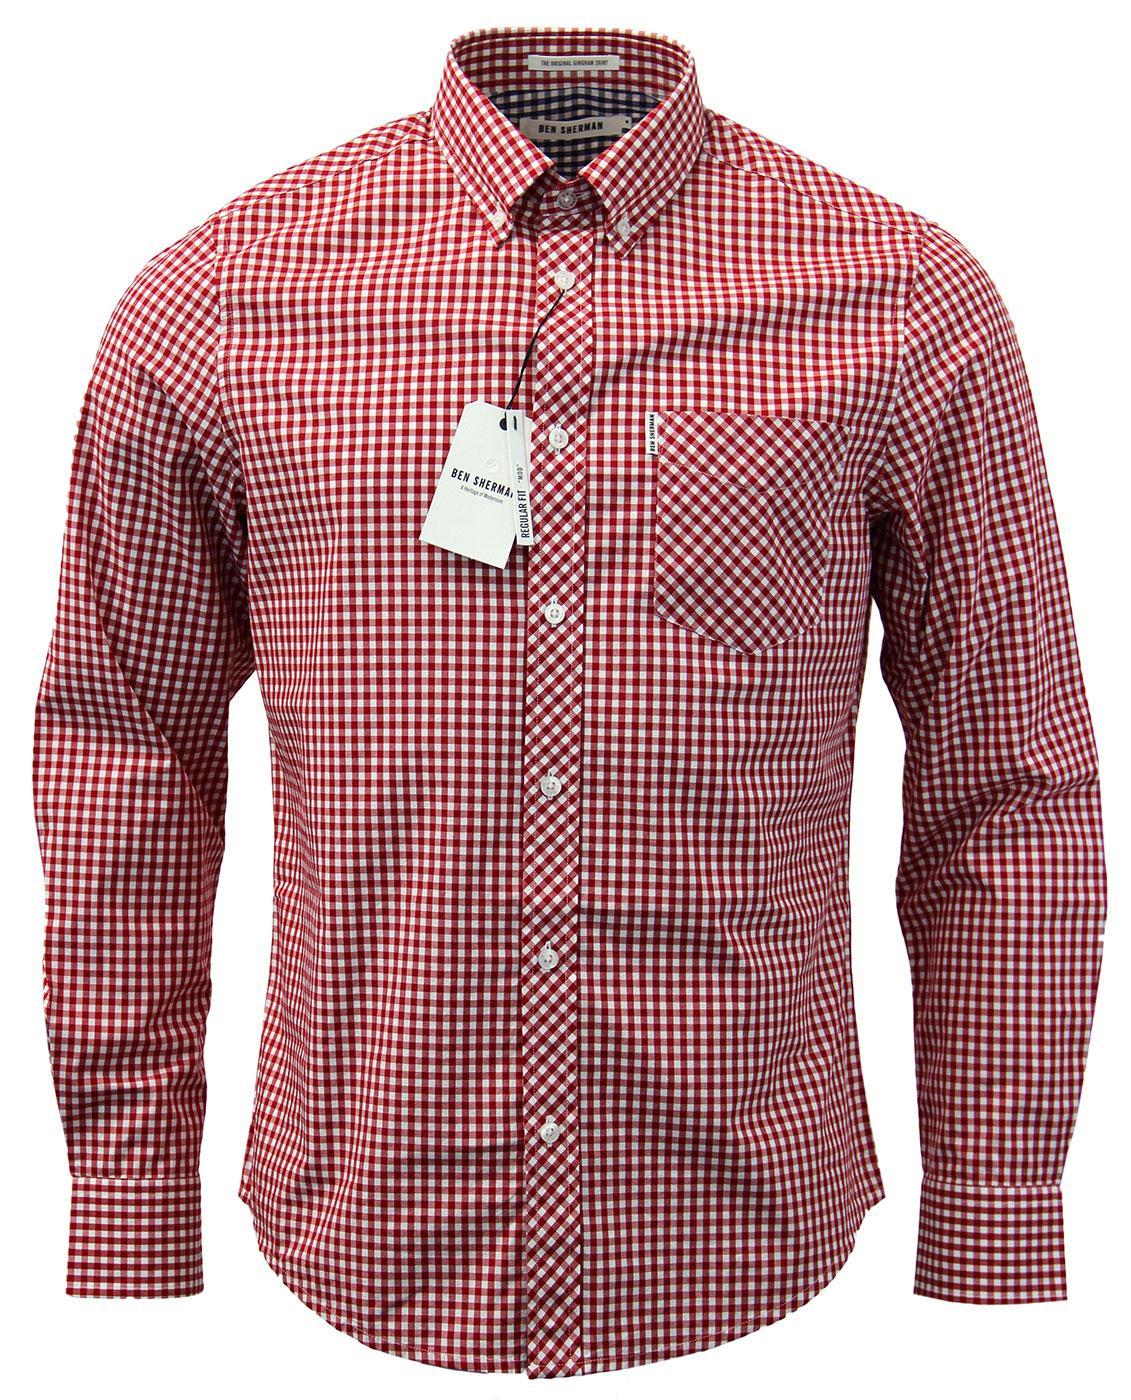 Ben Sherman Retro Mod L S The Original Gingham Shirt Red